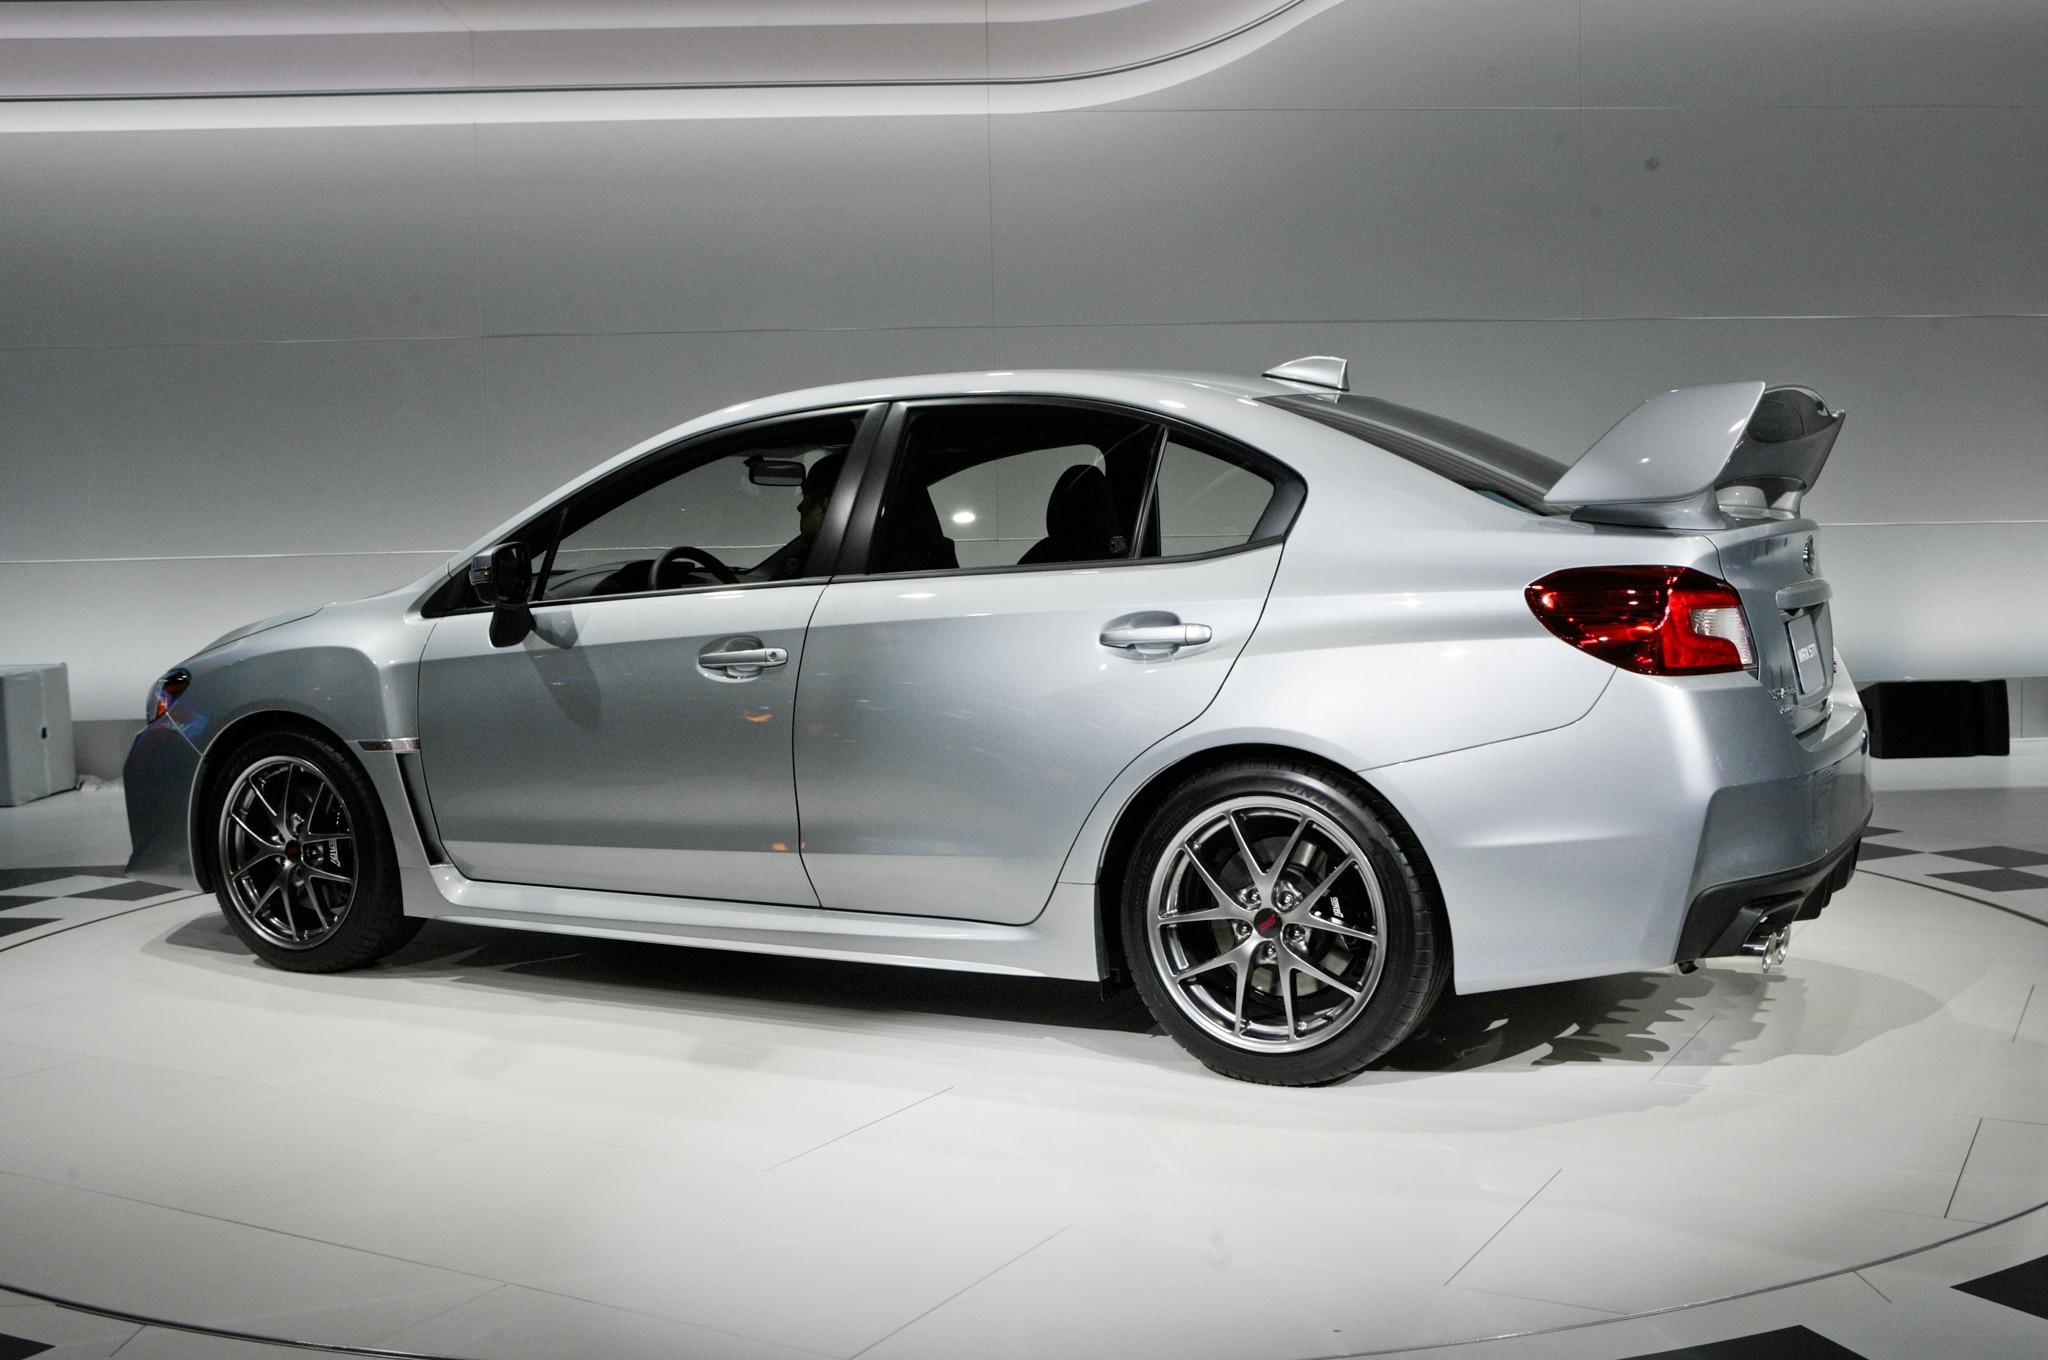 Detroit 2014: 2015 Subaru WRX STI Continues Its Go-Fast ...